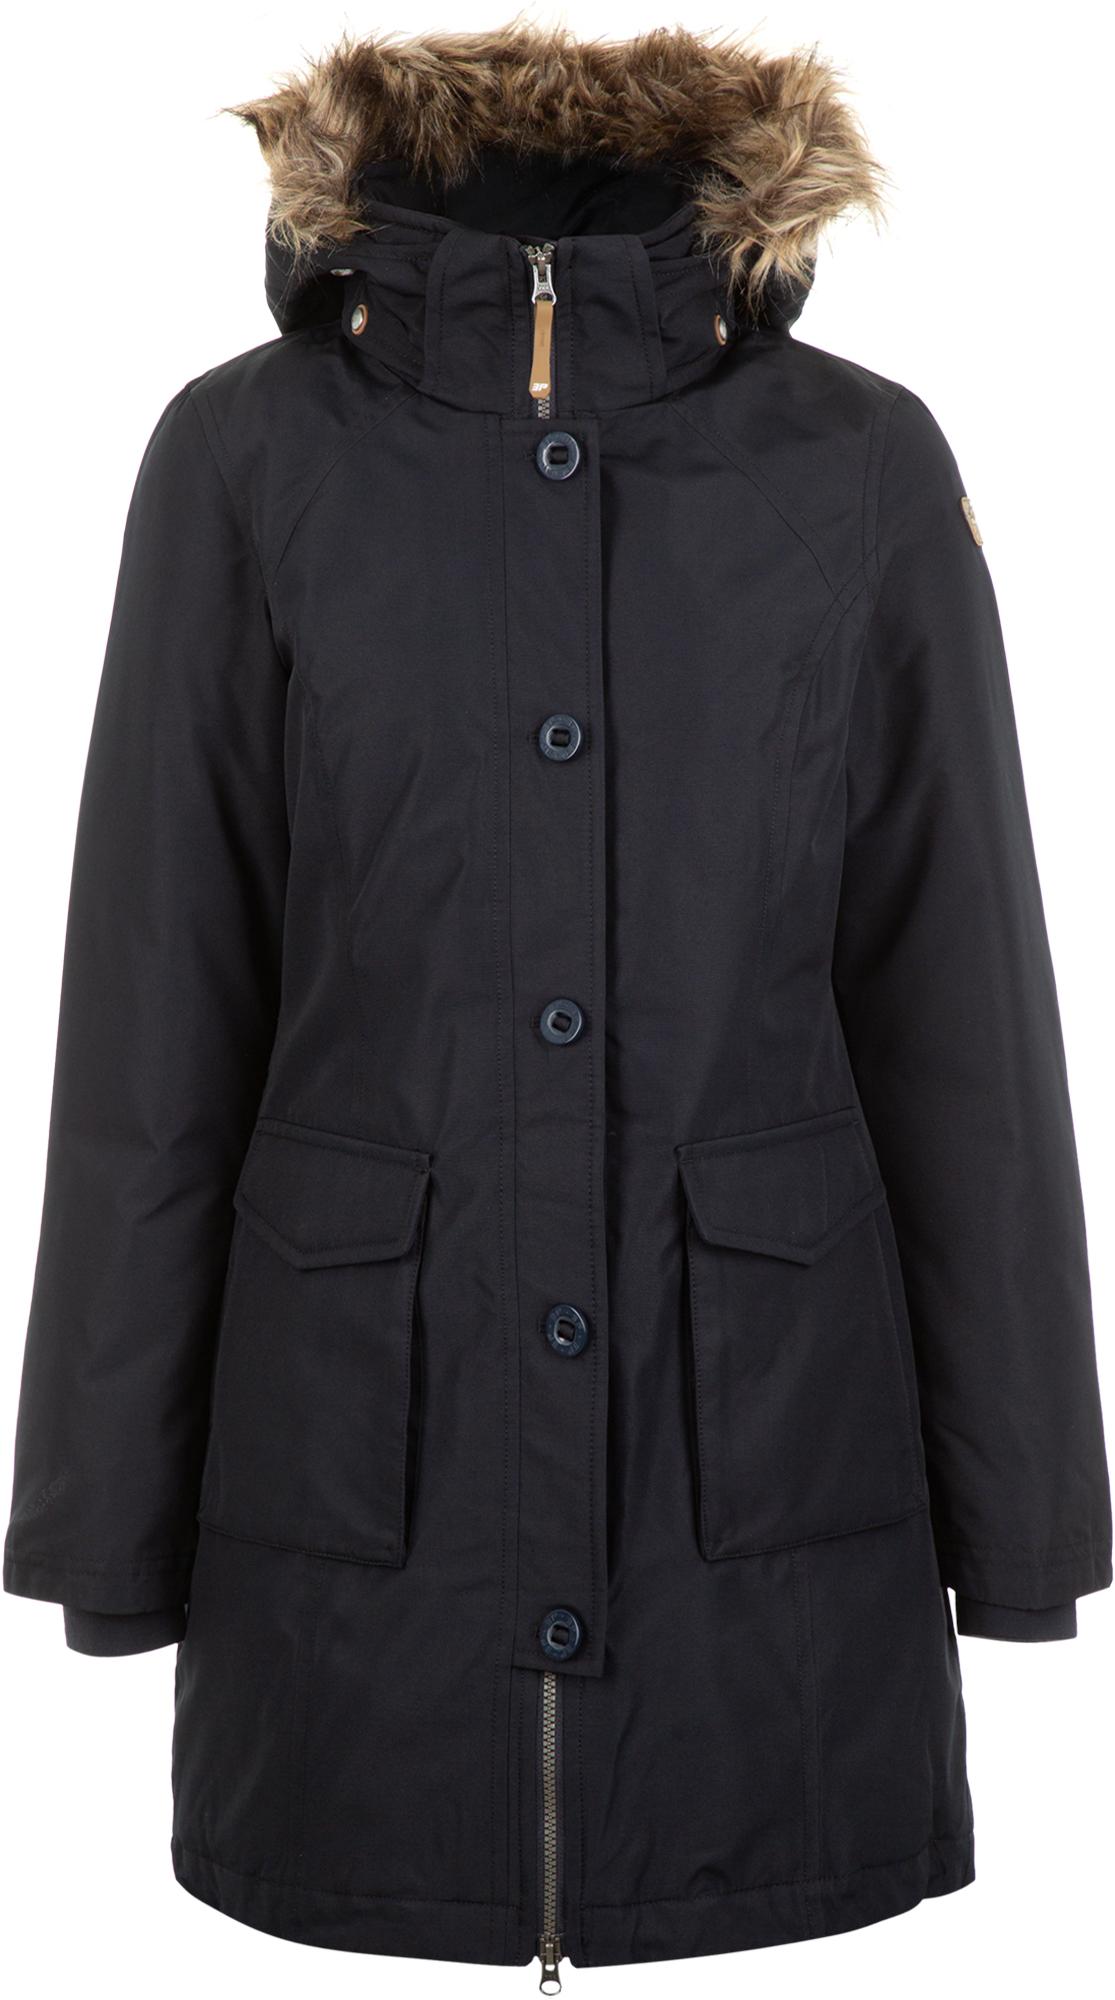 IcePeak Куртка утепленная женская IcePeak Arcadia, размер 52 цены онлайн